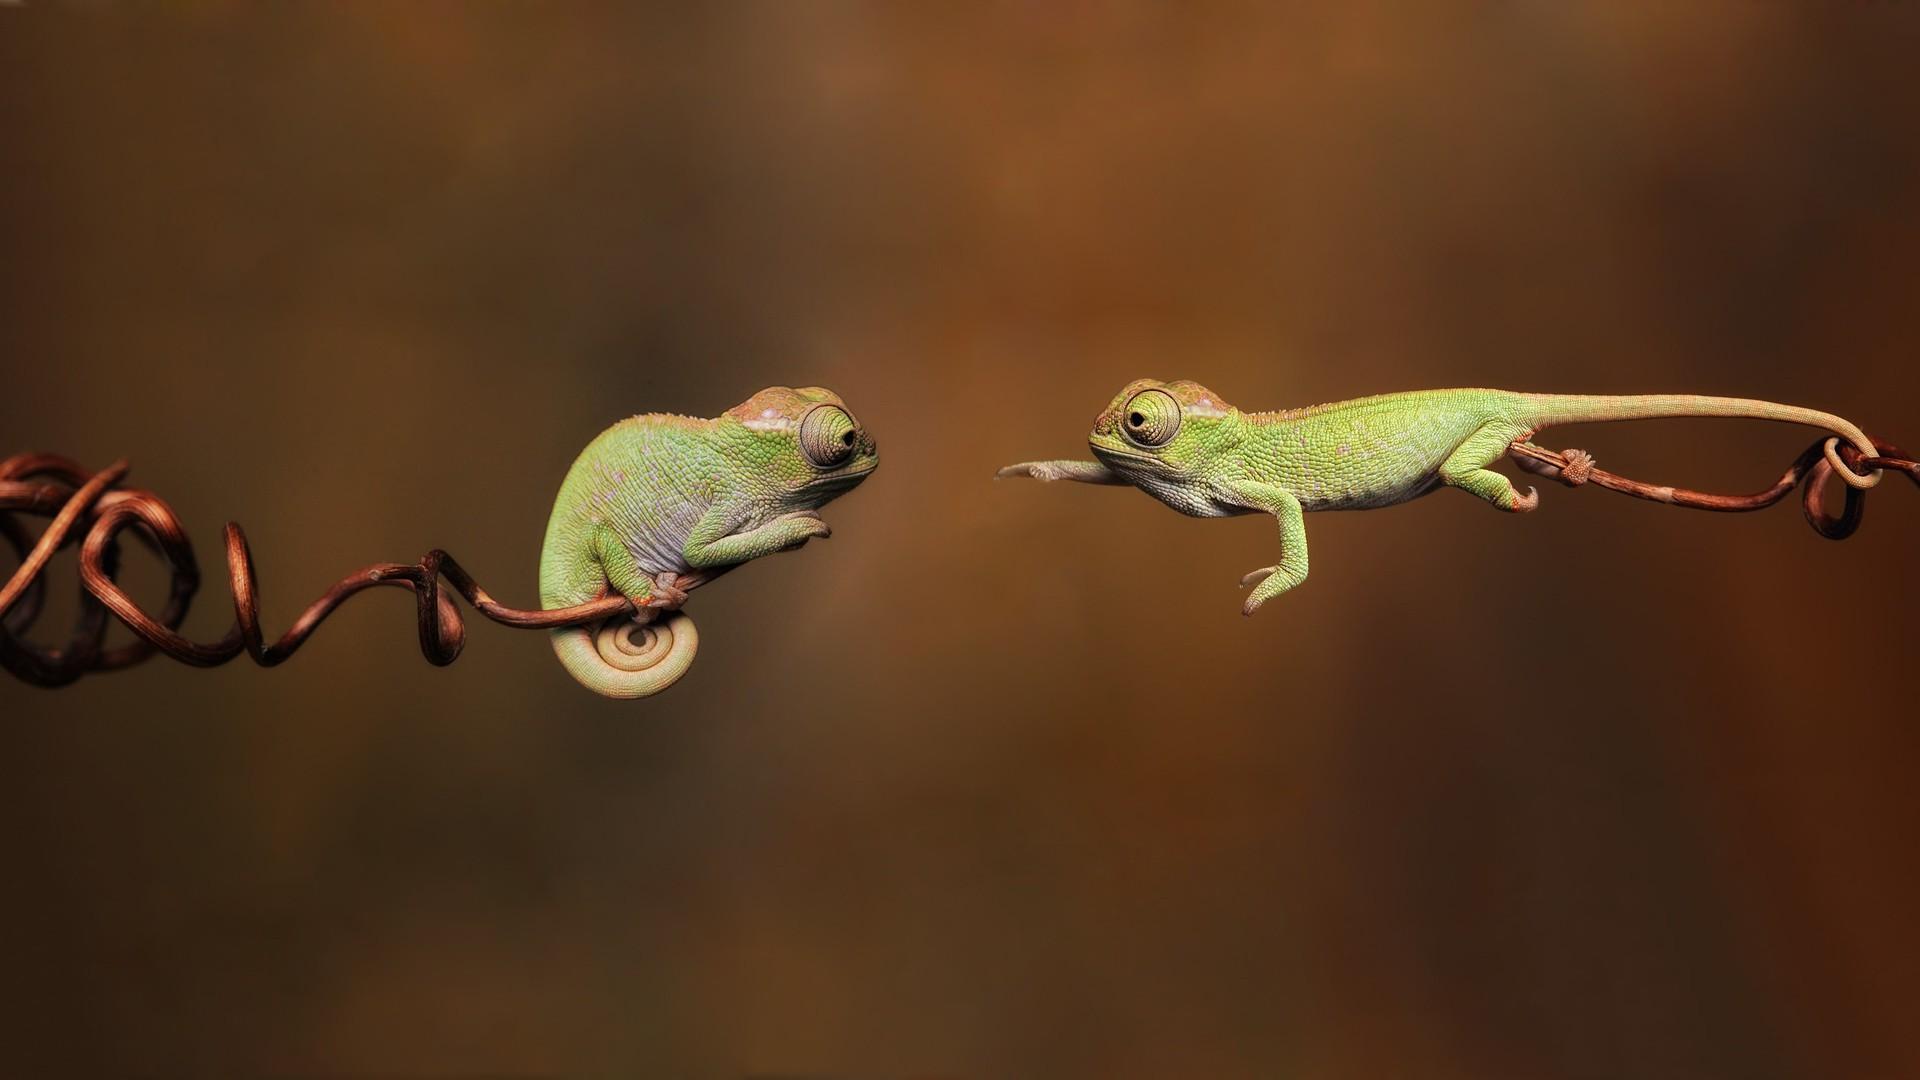 Wallpaper Animals Jumping Green Wildlife Blurred Hope